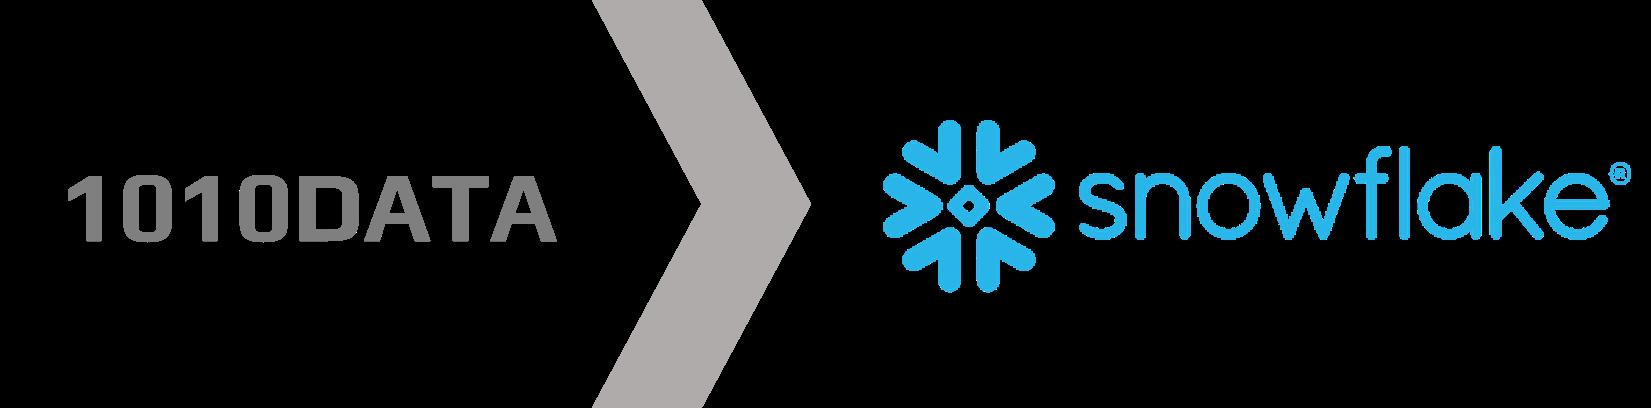 CASE STUDY: 1010Data Conversion to Snowflake